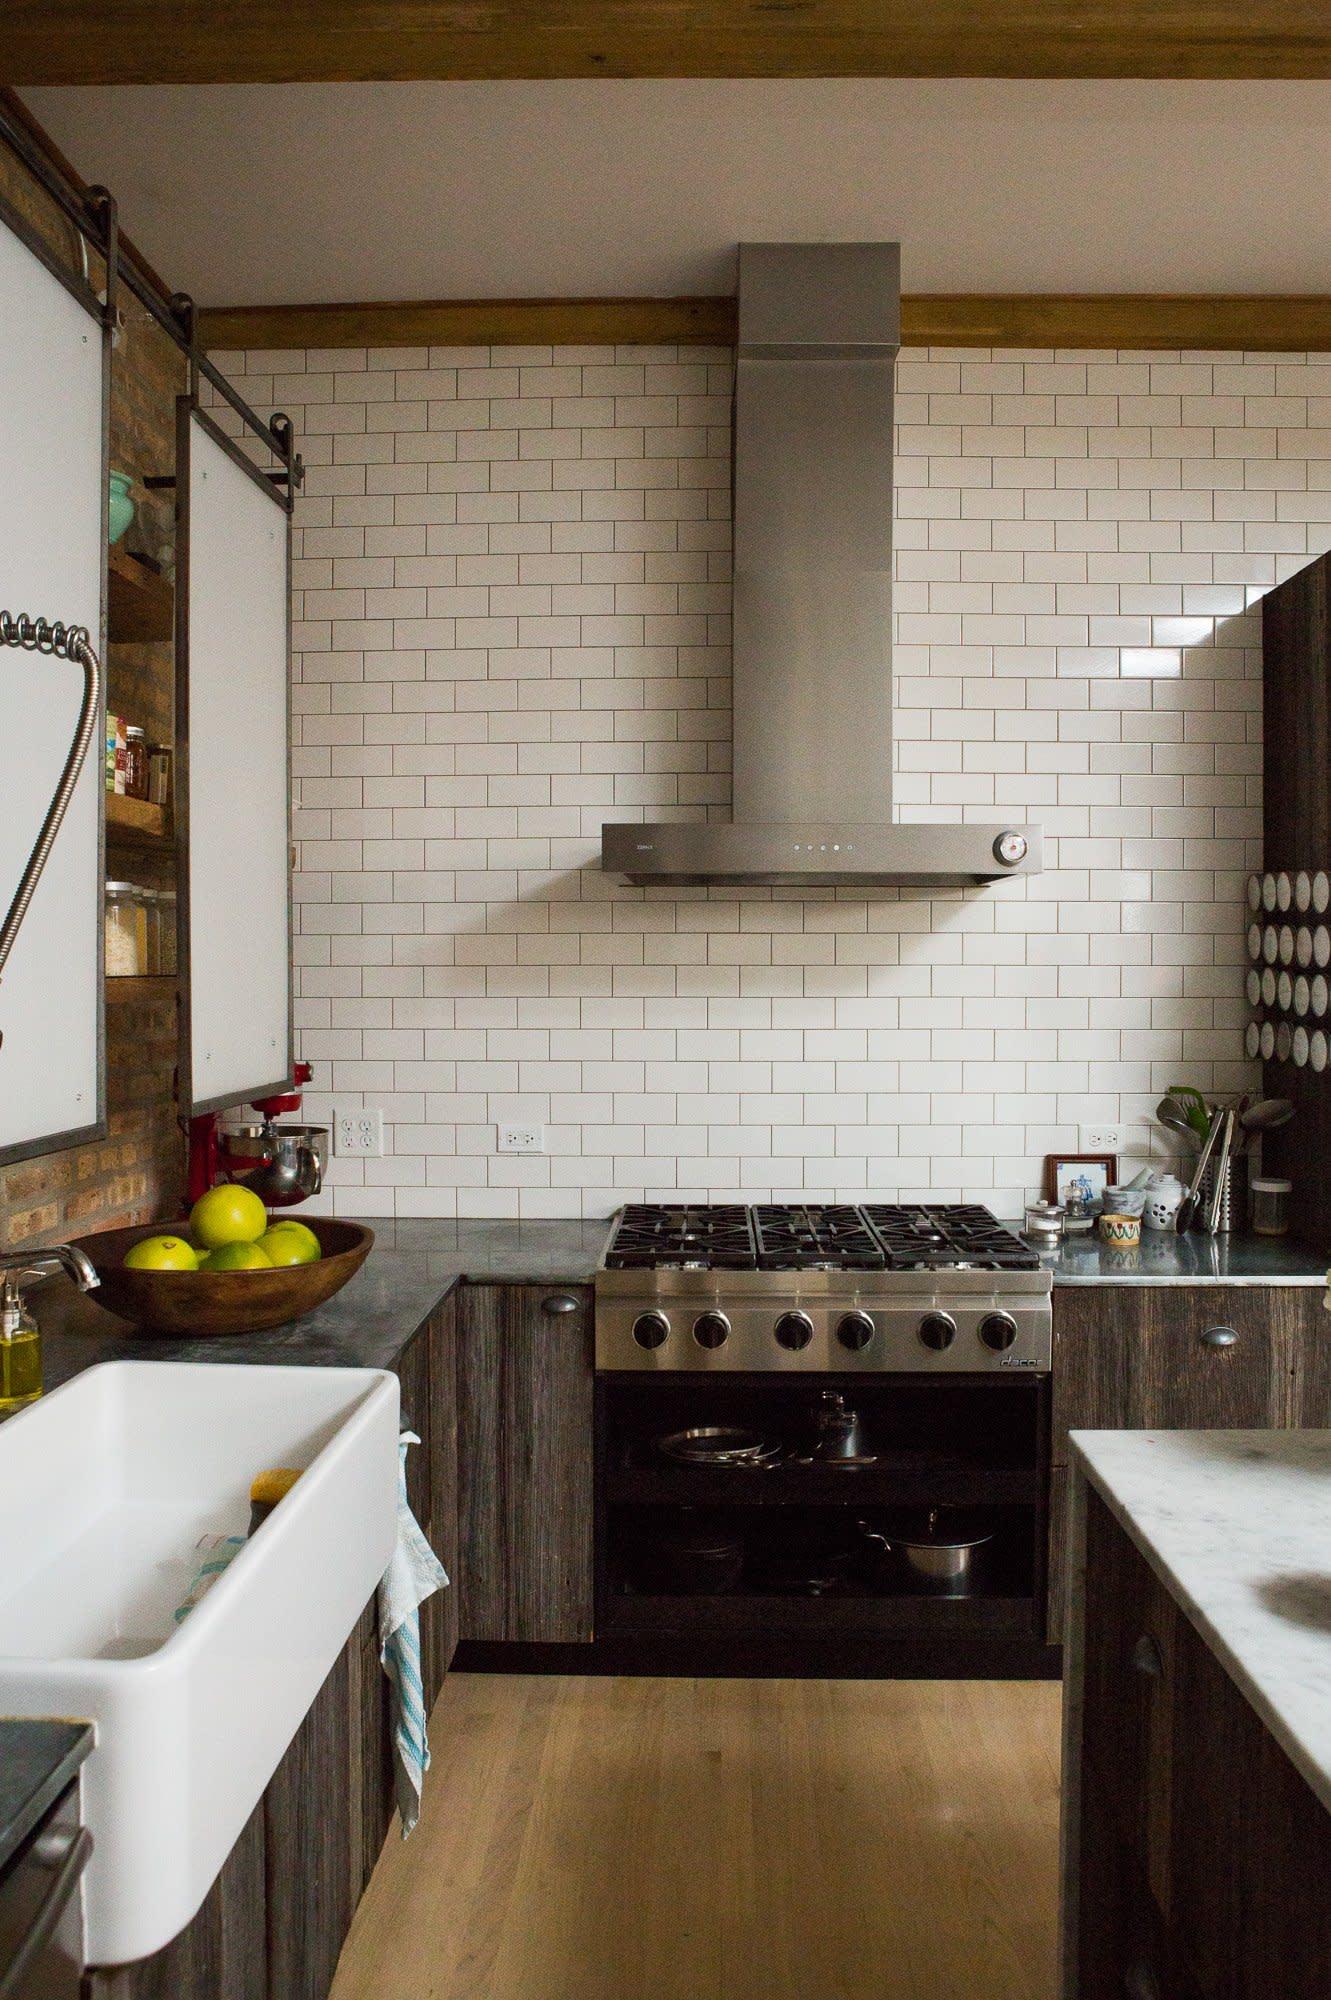 Ellen & Greg's Renovated Loft Kitchen: gallery image 12